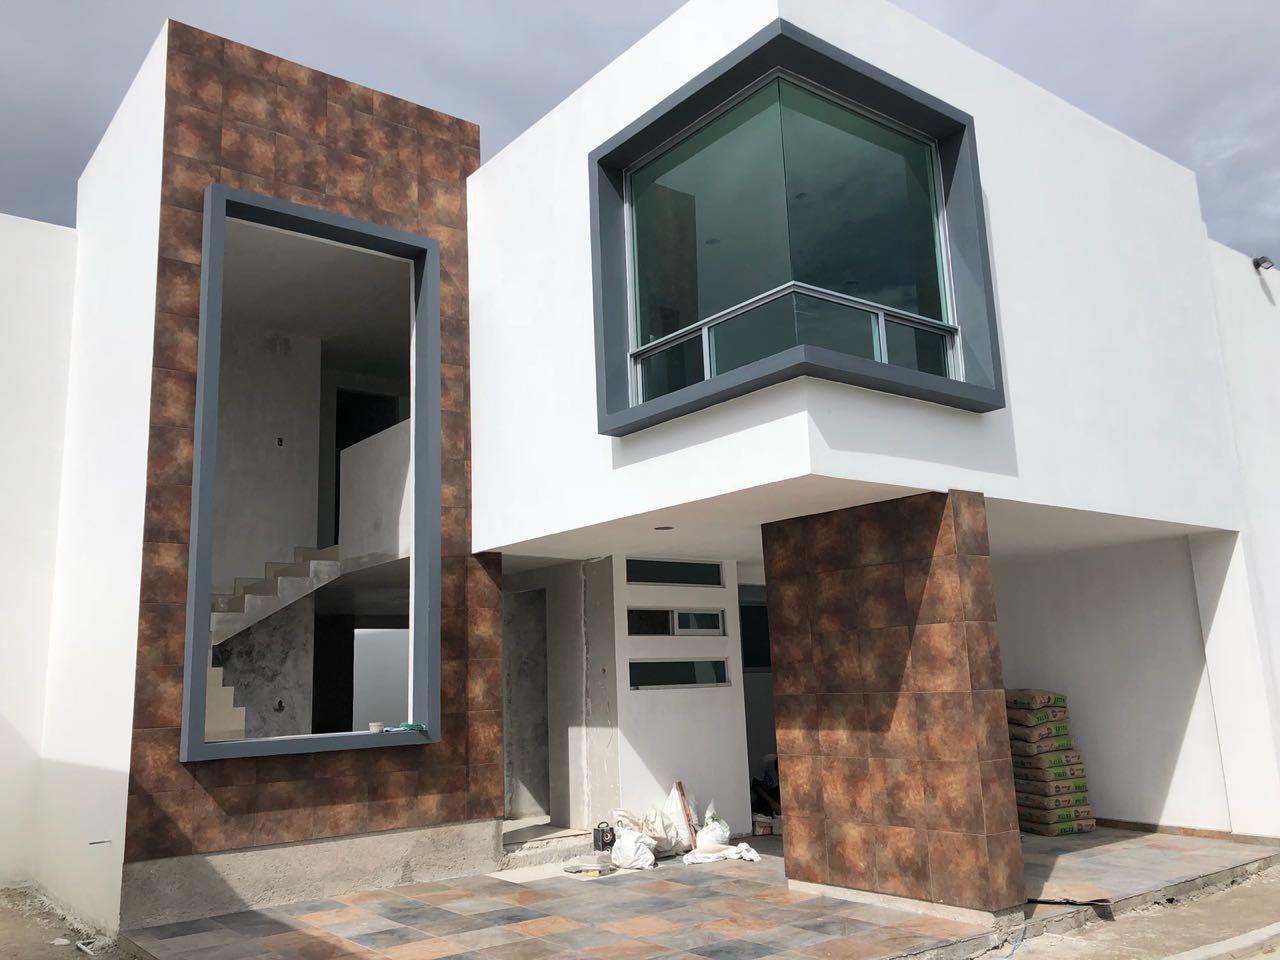 Venta casa con 3 recamaras amplias a 2 minutos de la UVM San Andres Cholula